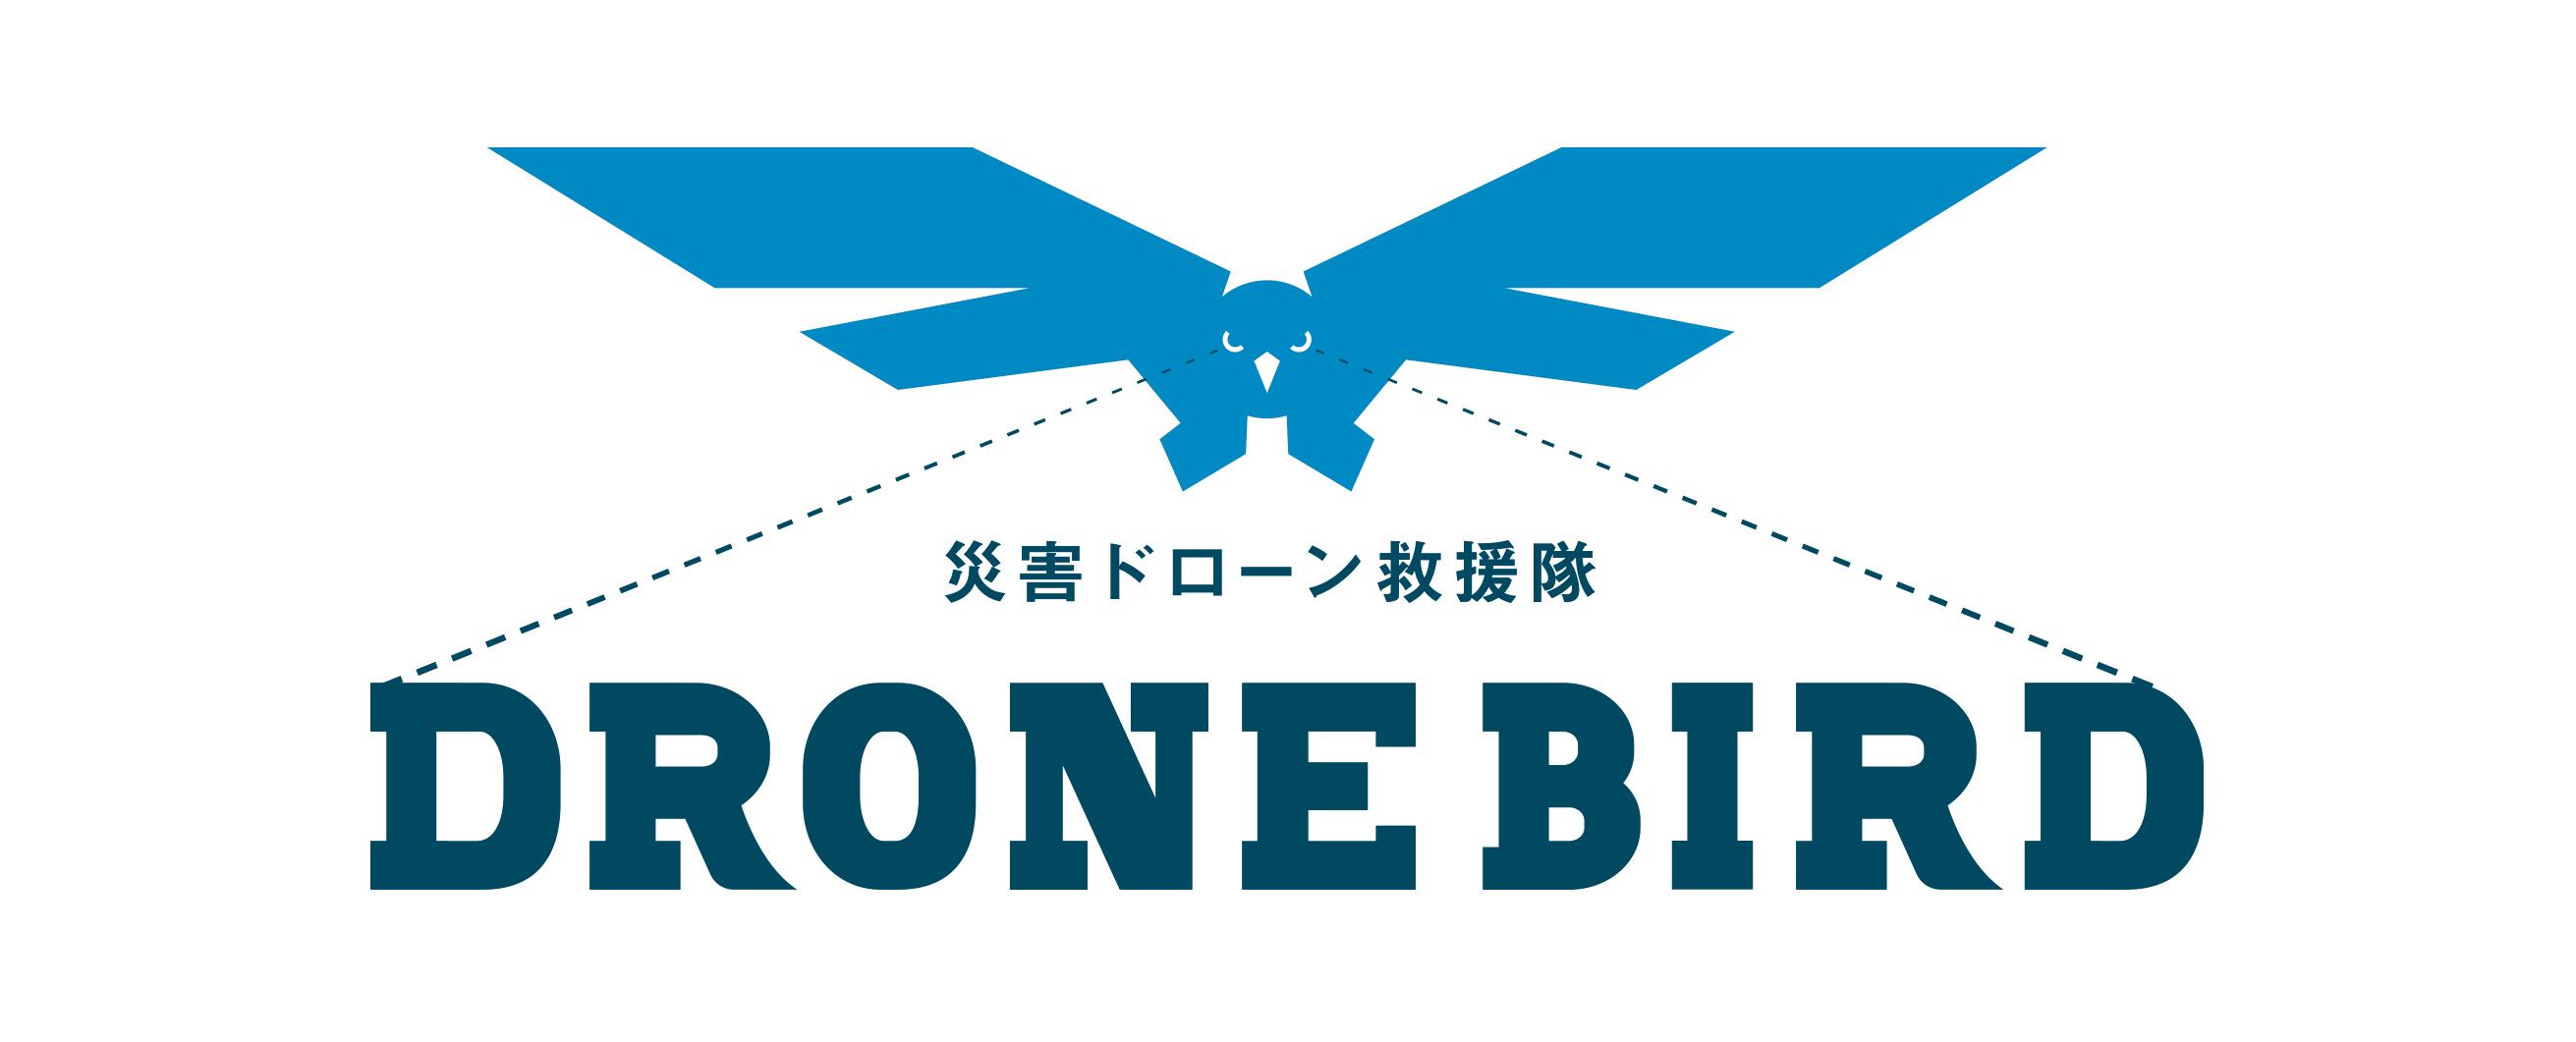 DRONEBIRD オフィシャル・オンラインショップ